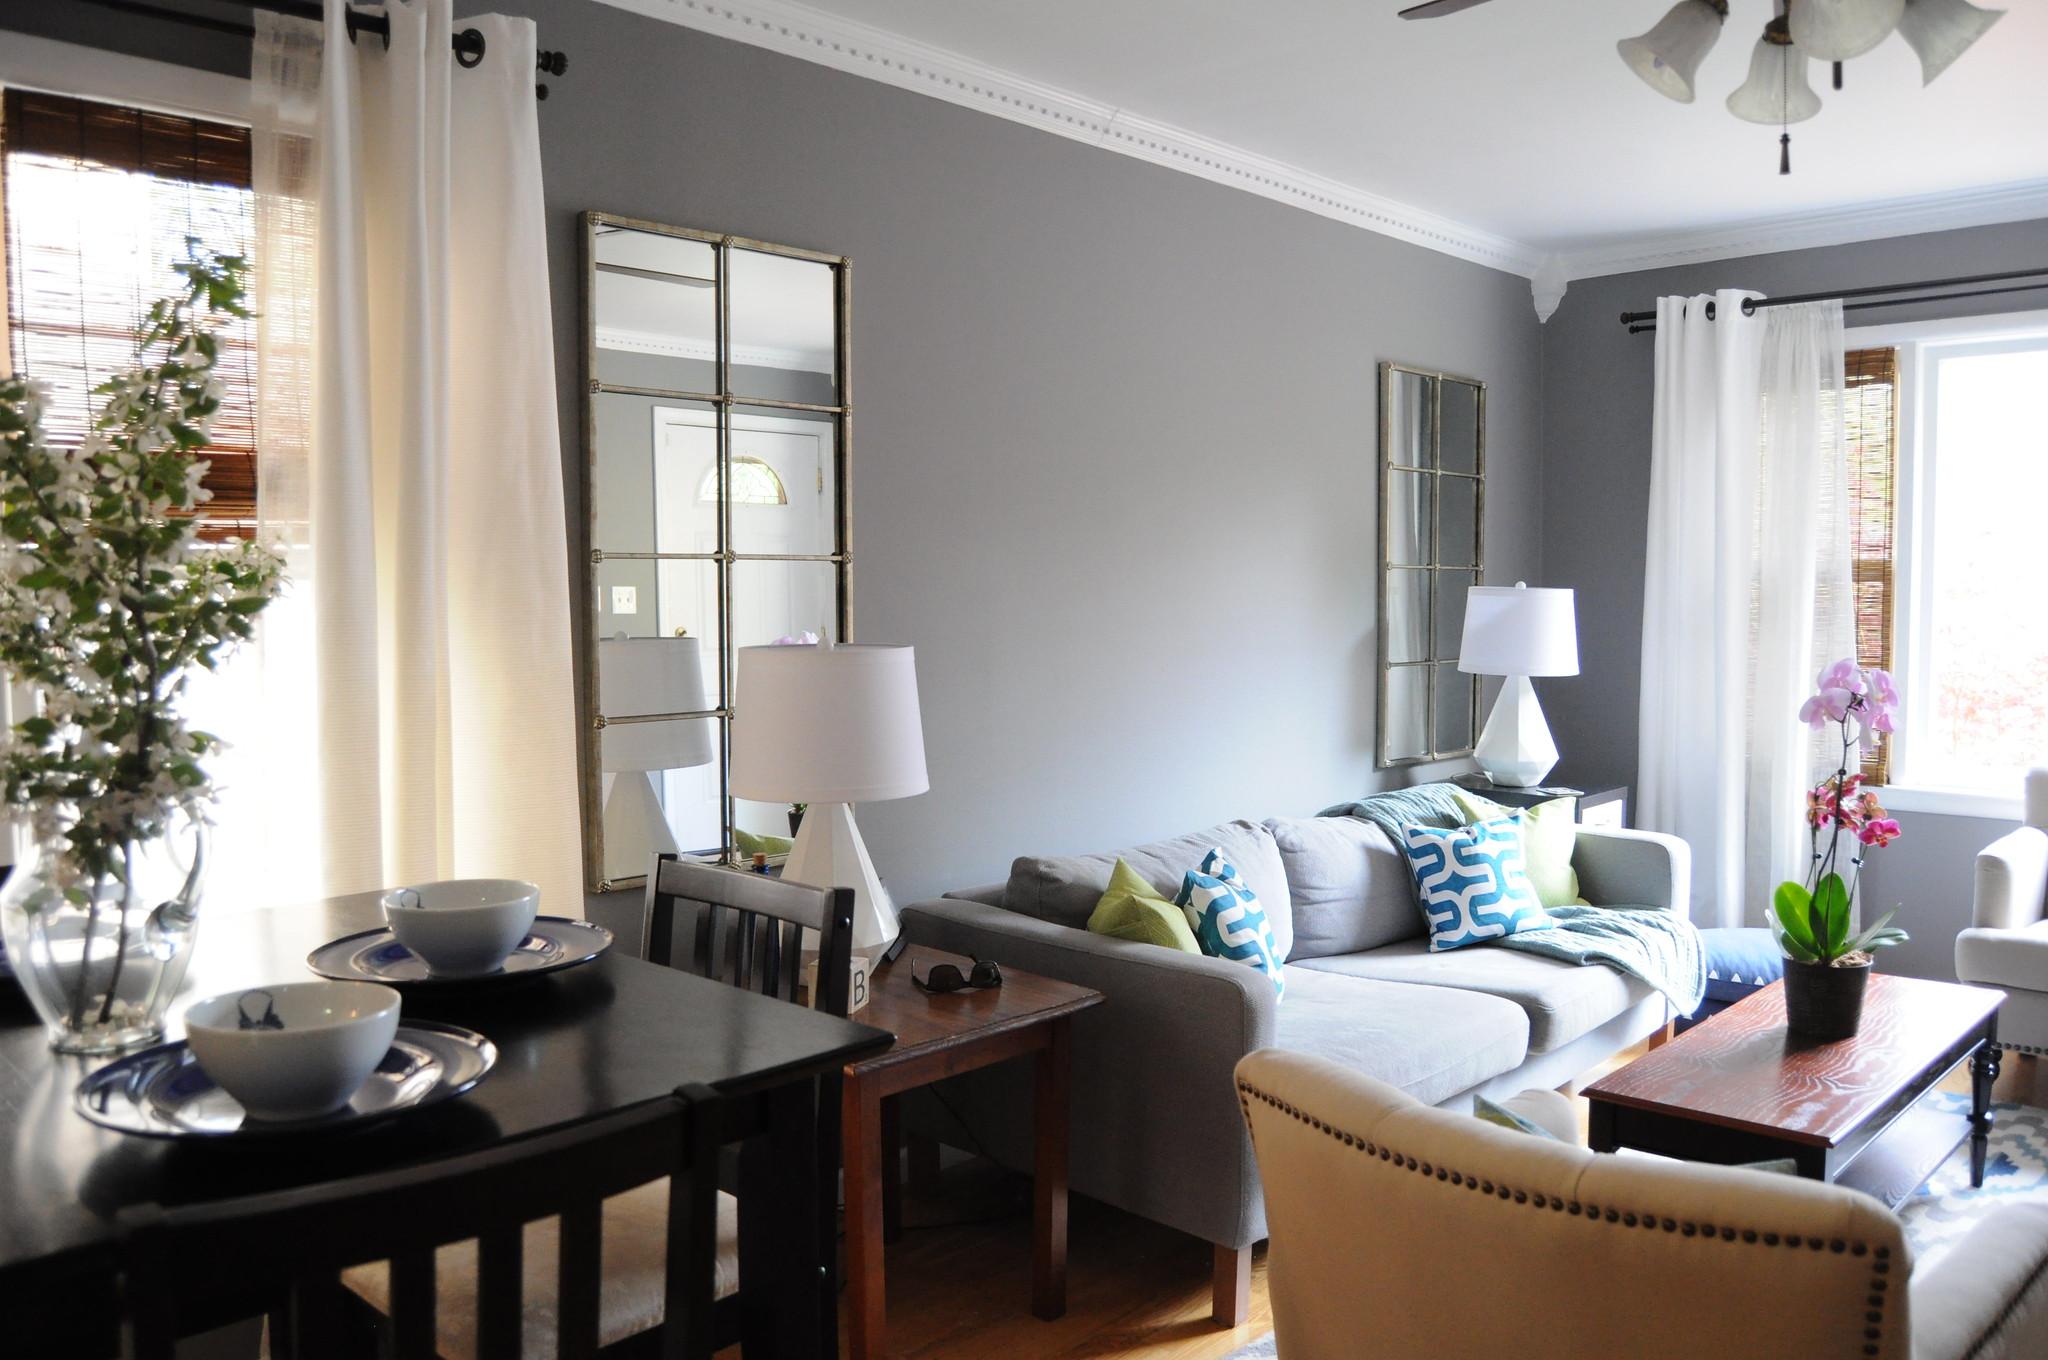 marvelous blue gray teal living room | Gray Teal Lime Blue Living Room | Flickr - Photo Sharing!